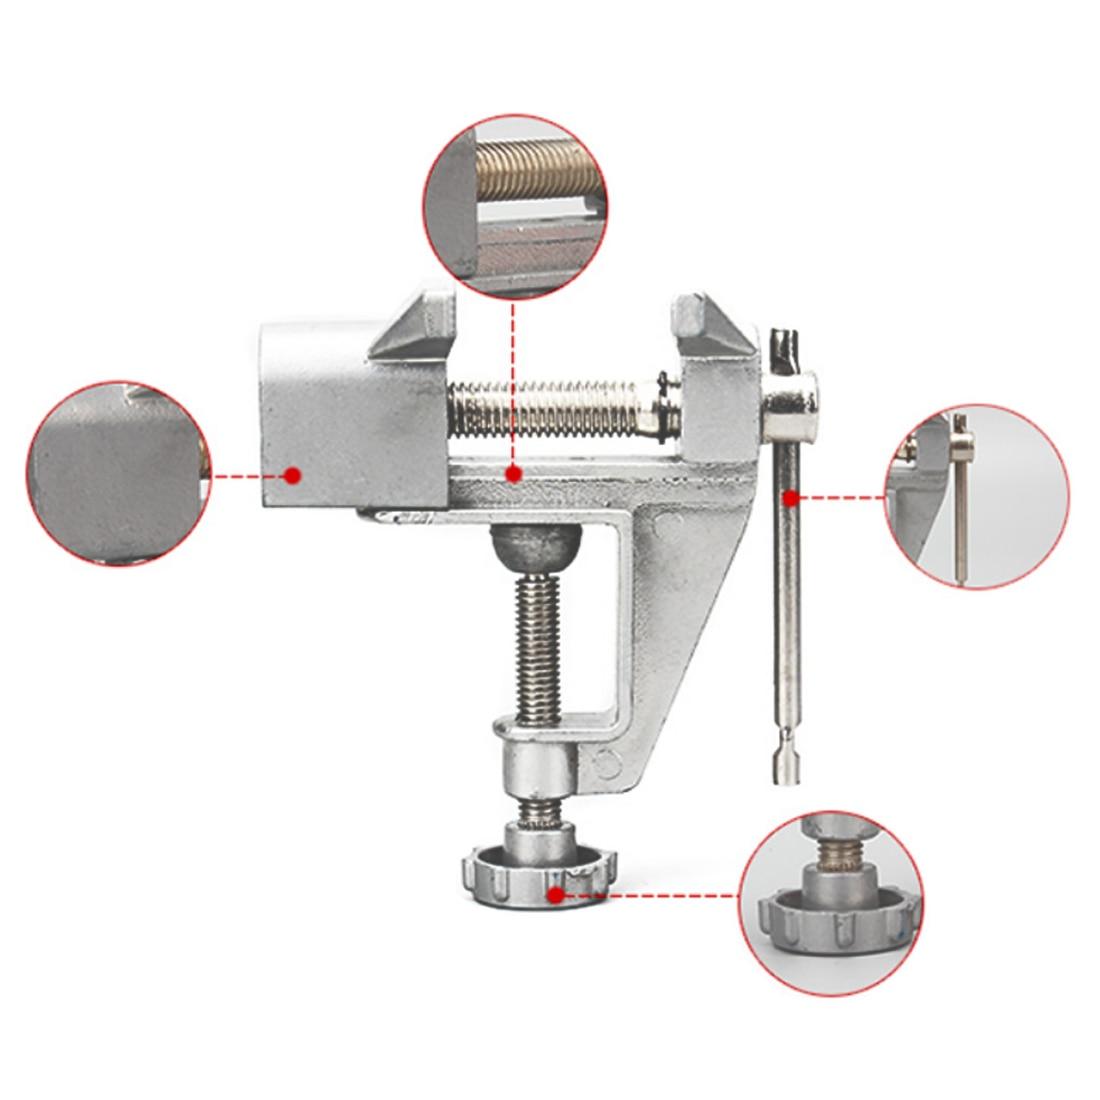 1pc 30mm Universal Mini Bench Vises Aluminium Alloy Table Screw Vise Bench Clamp